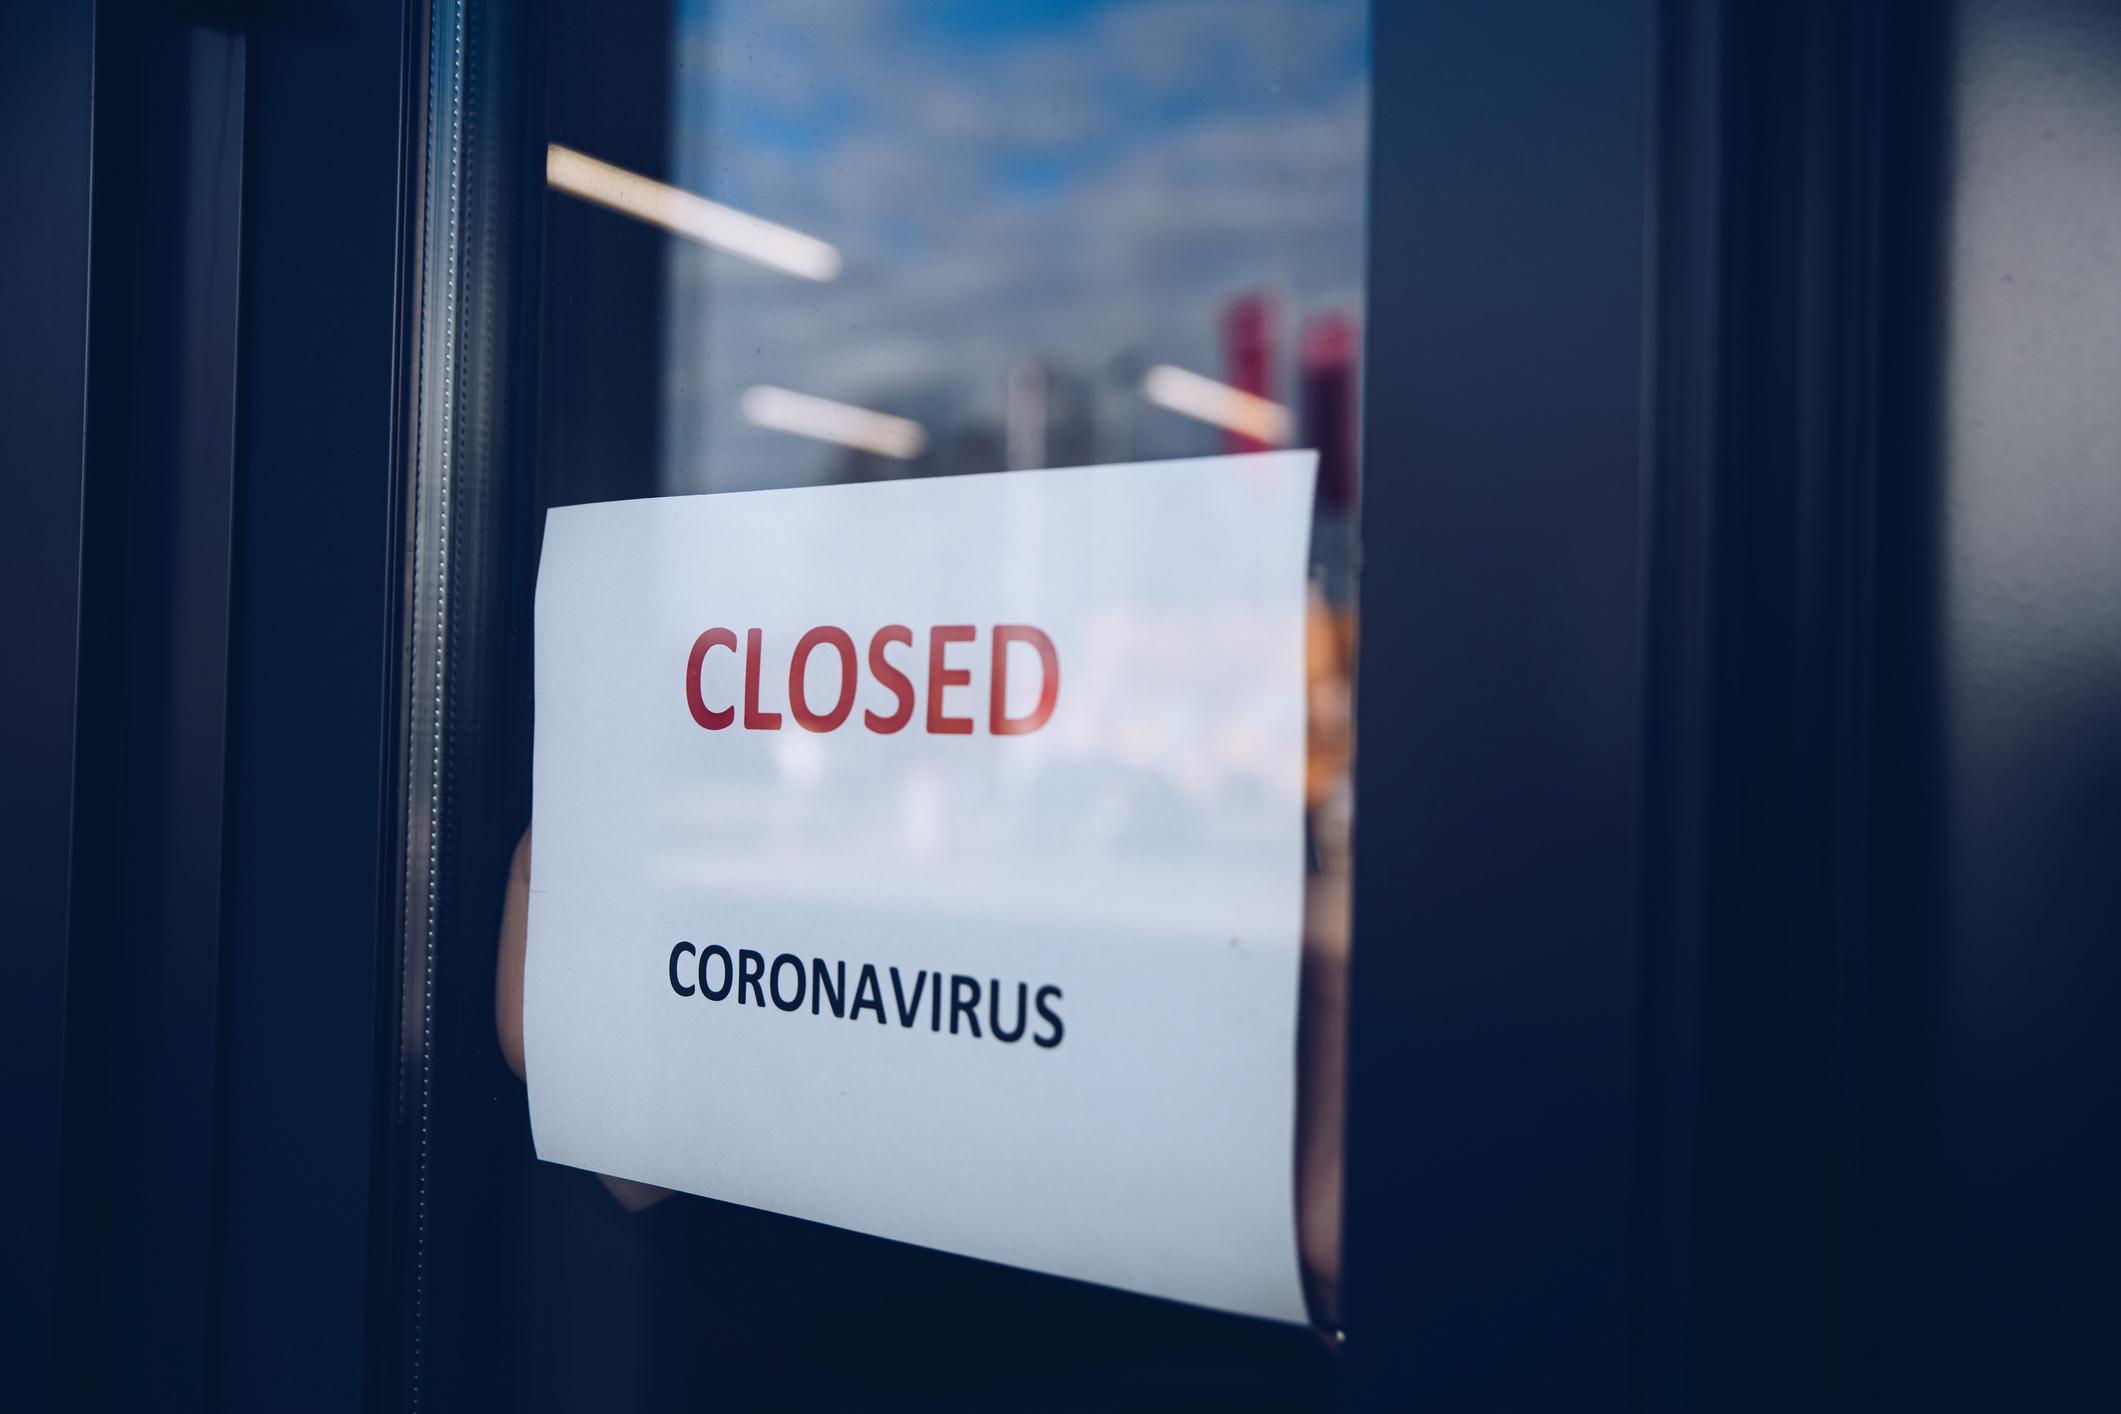 Coronavirus: Sturgeon looks at countries planning to reopen schools | Tes